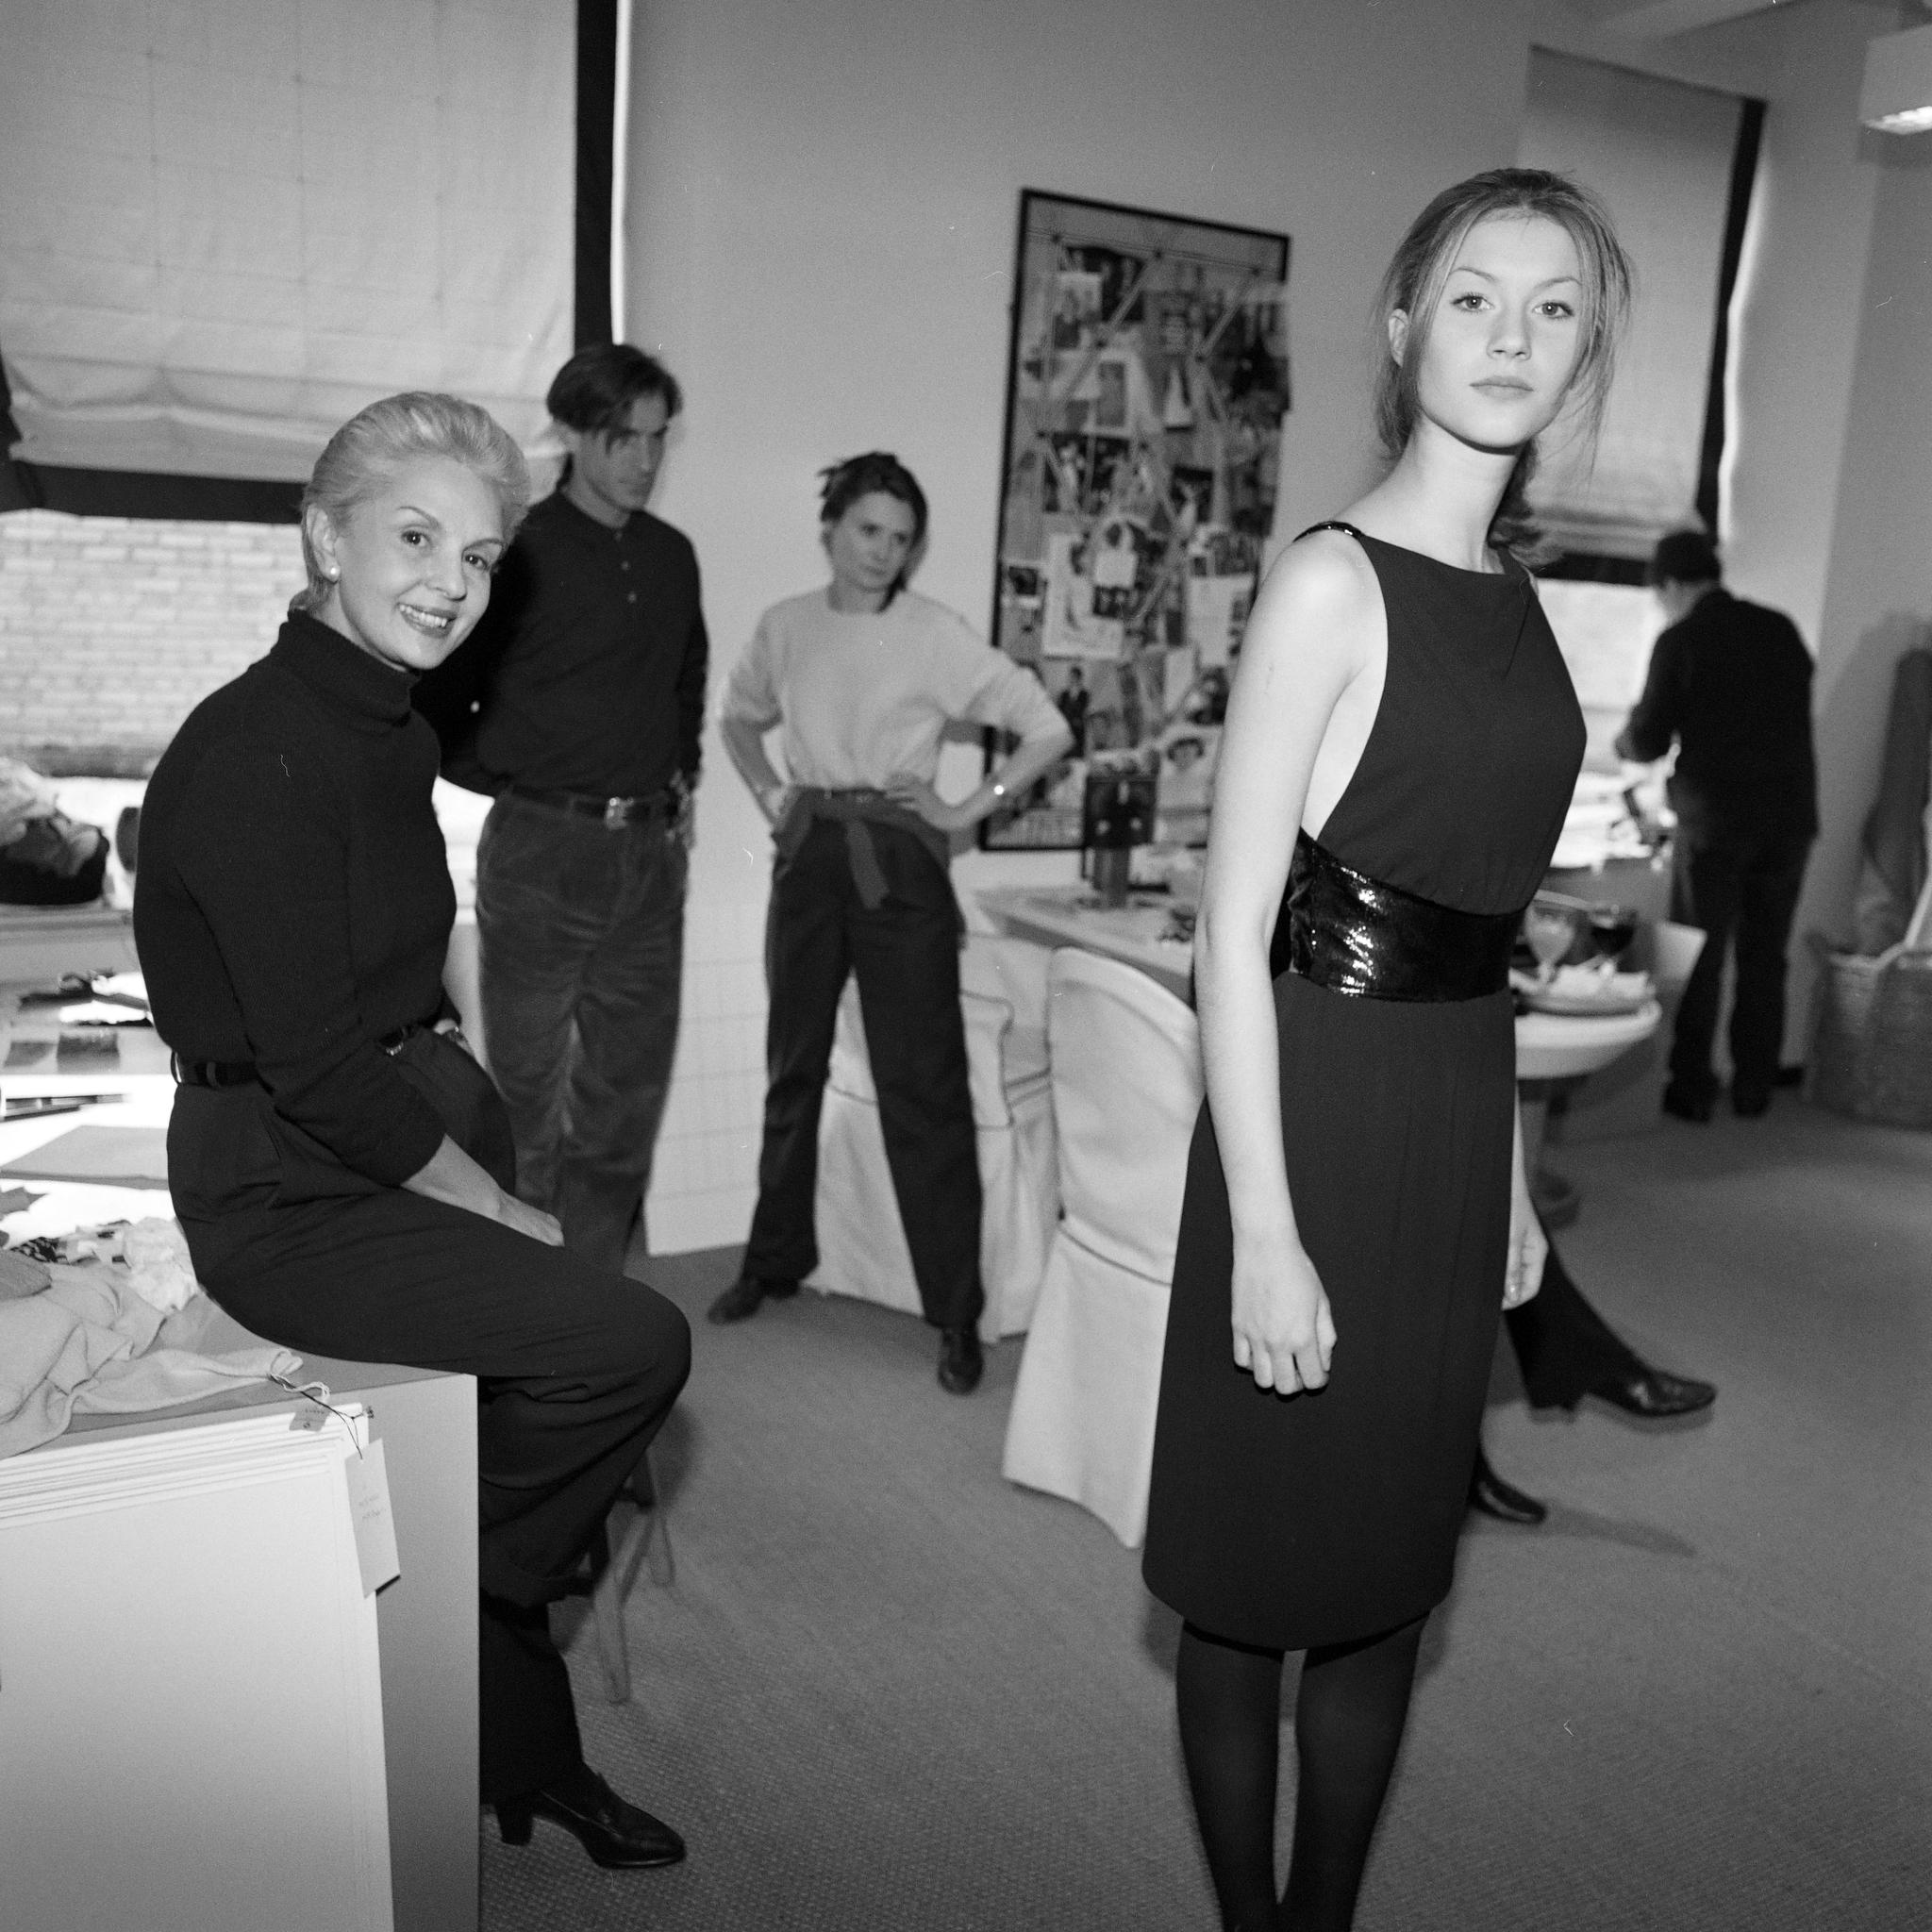 Designer Carolina Herrera and staff in fall fitting with model Gisele Bundchen.